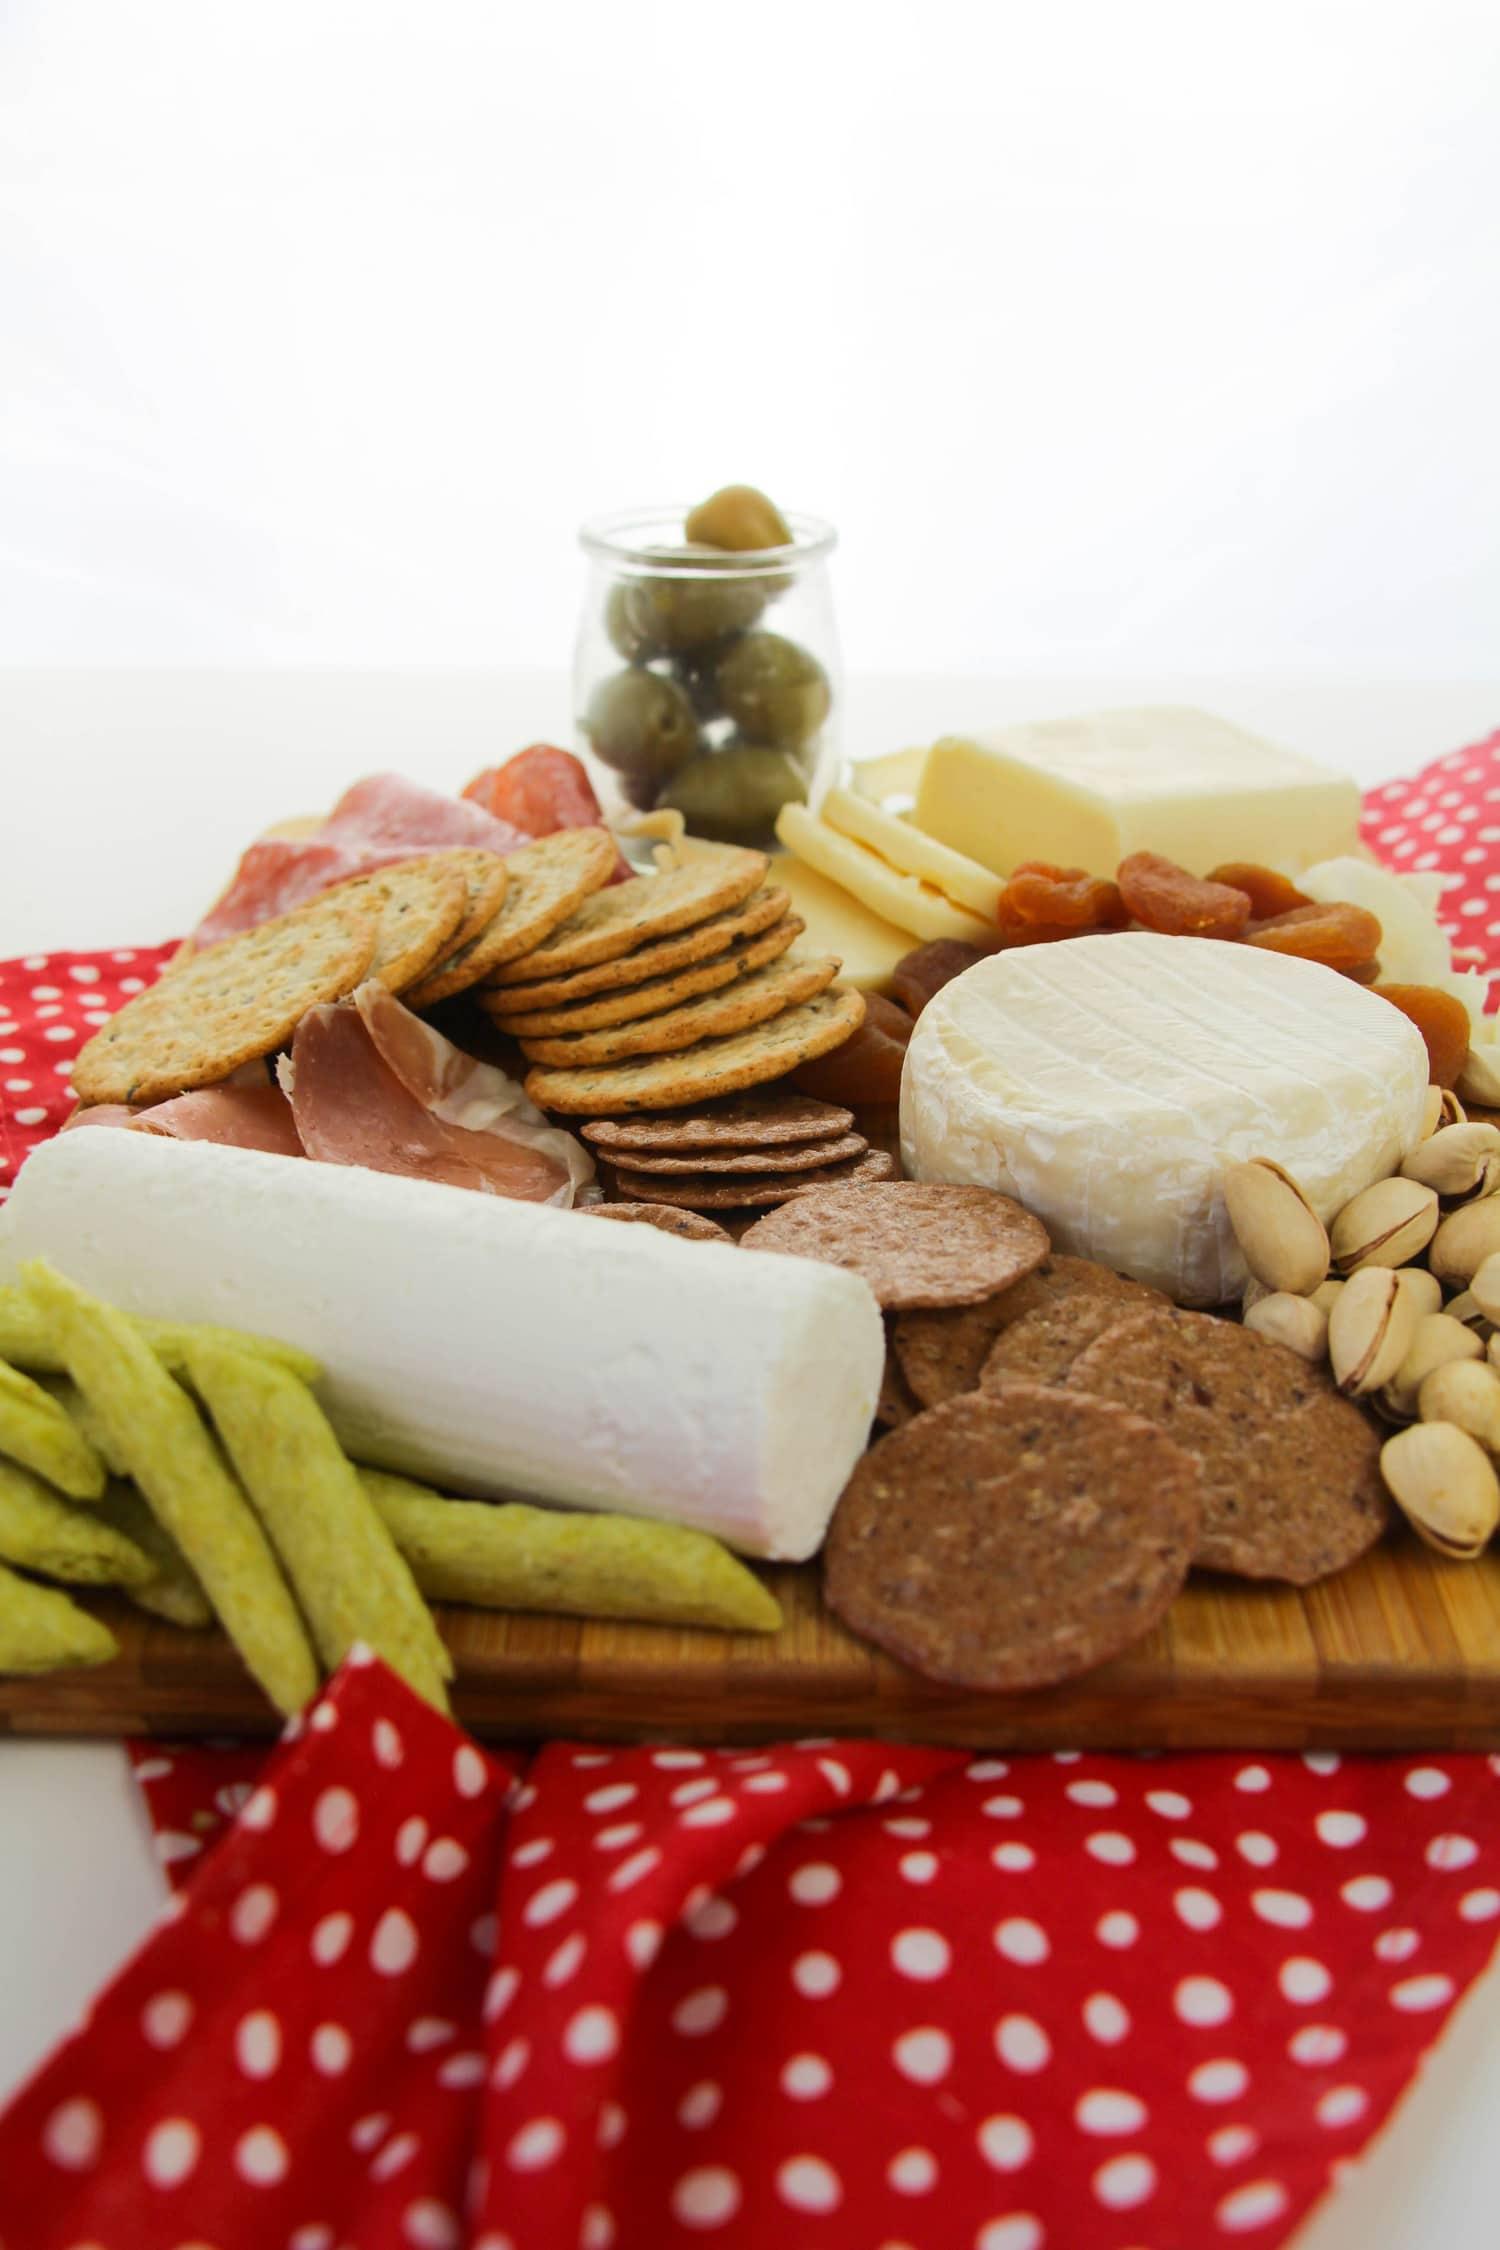 Items on Gluten-Free Cheeseboard